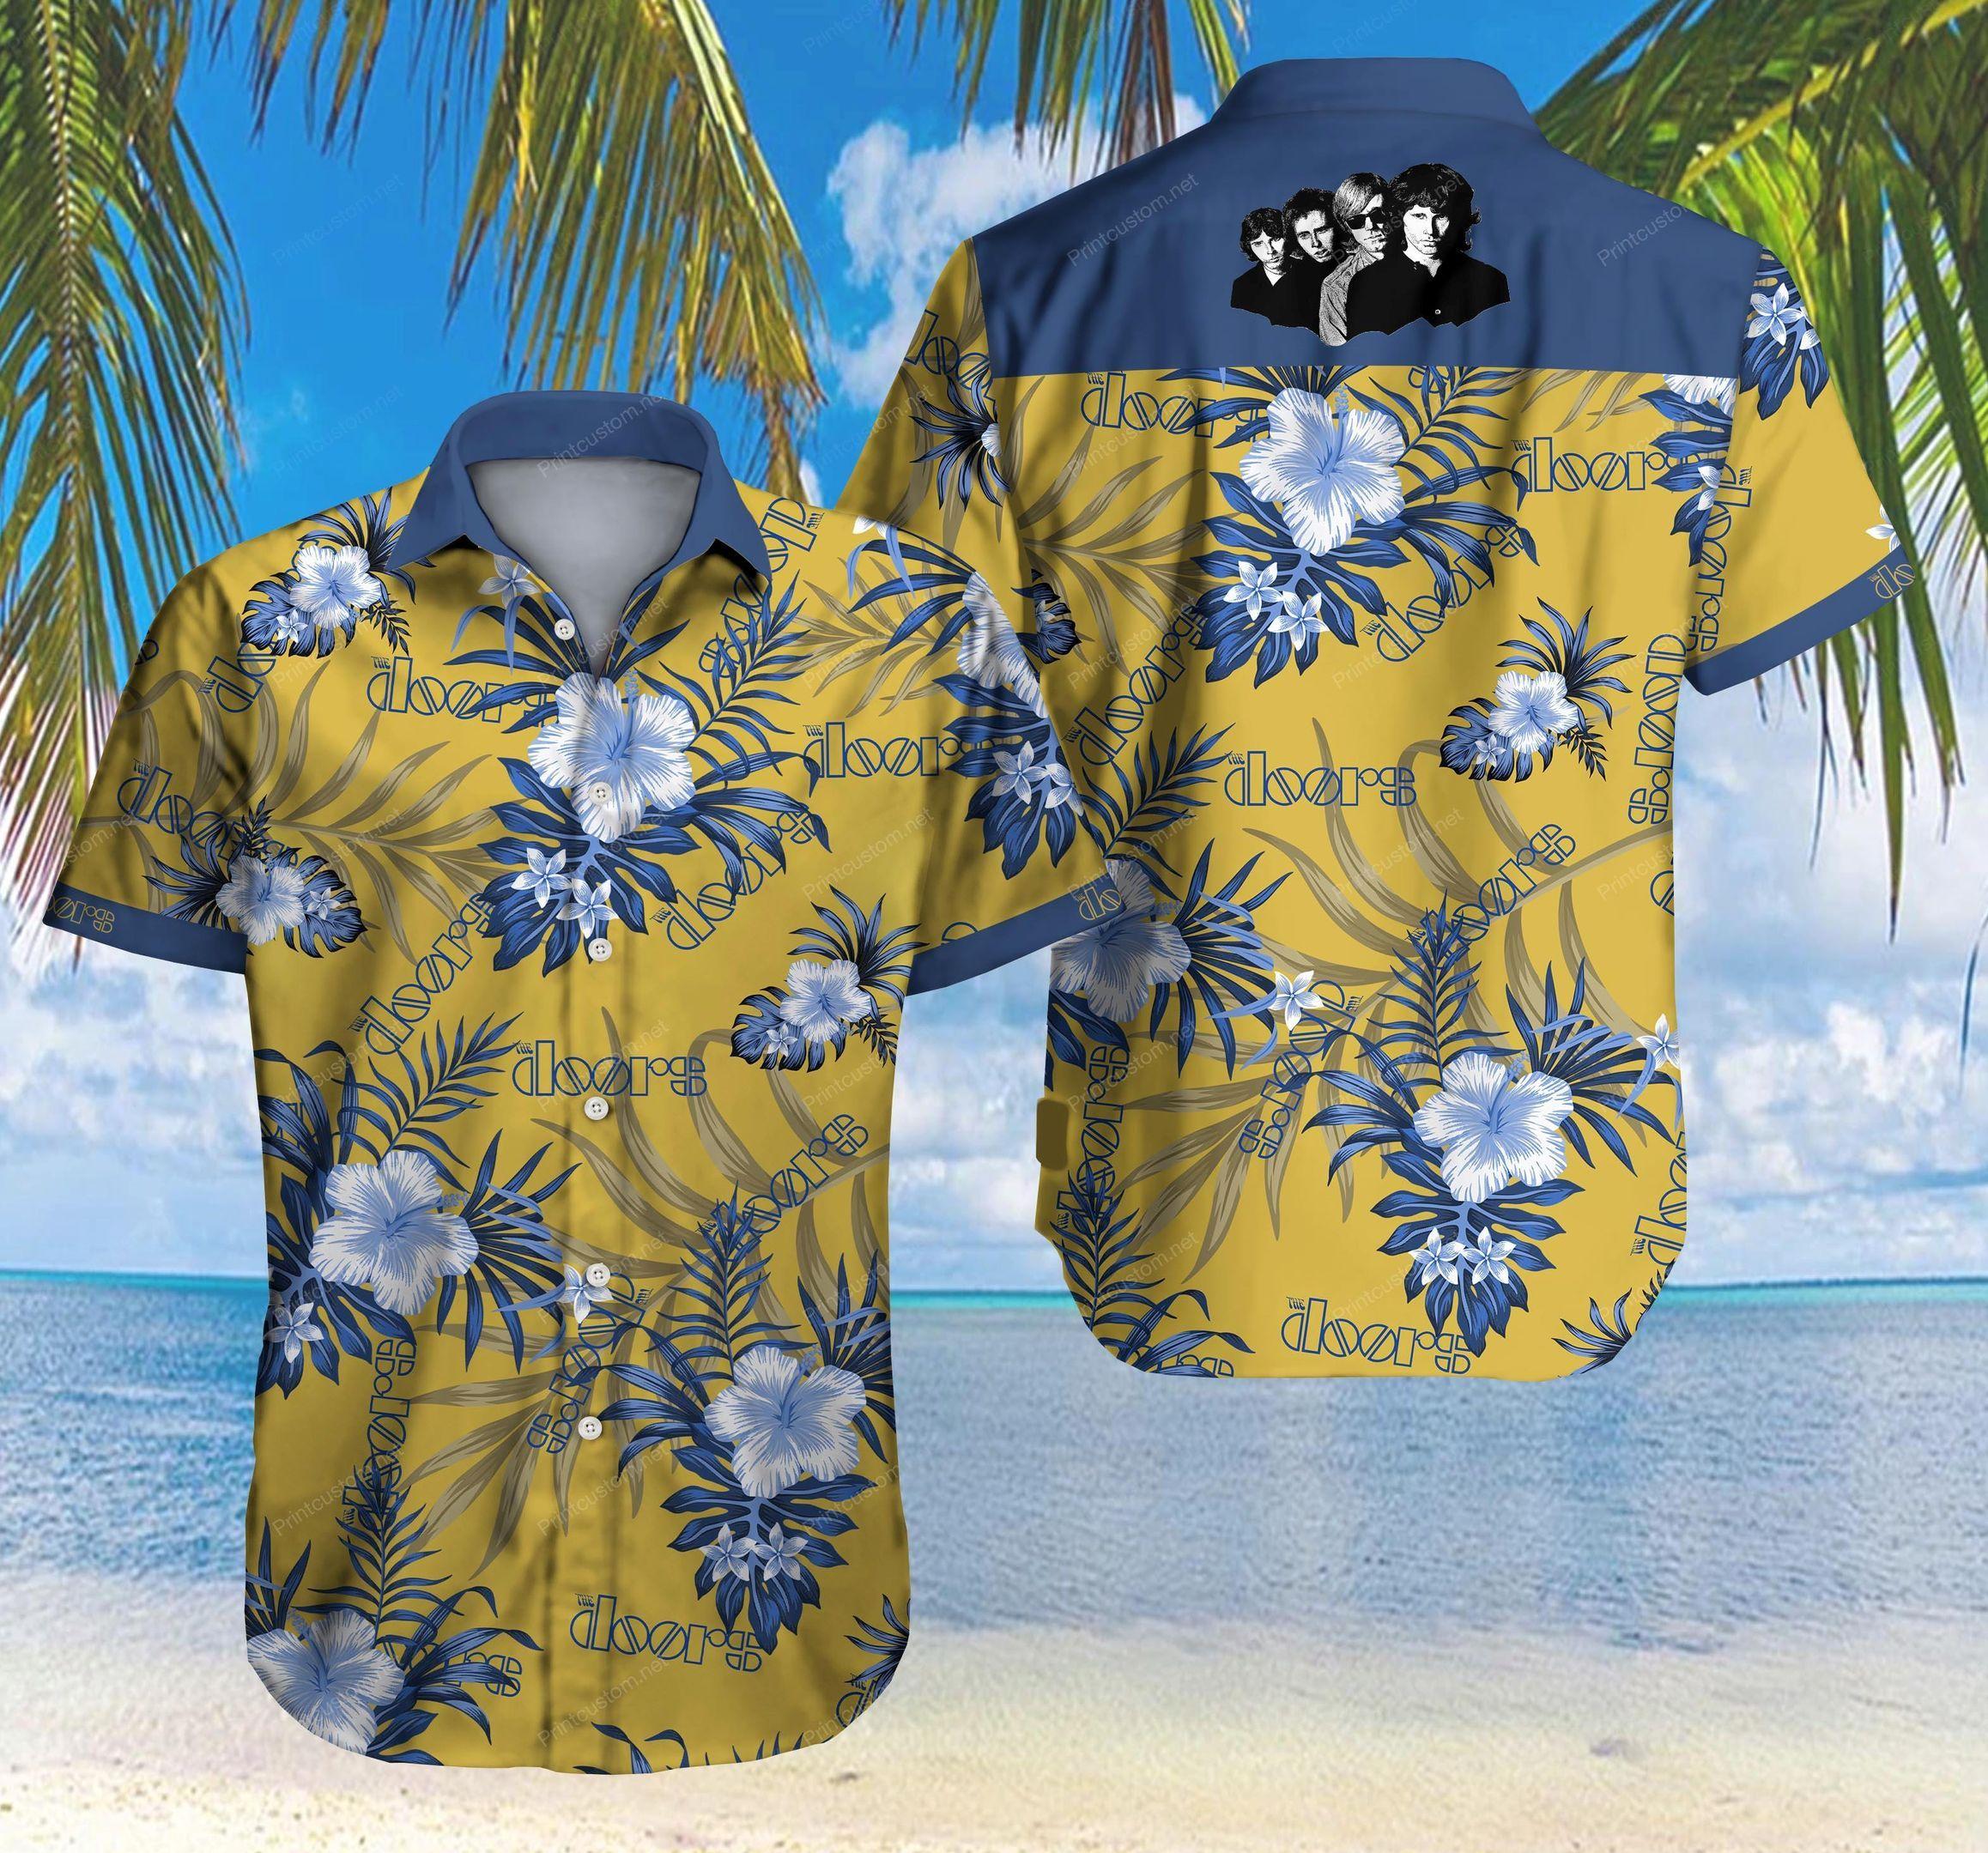 The Doors Rock Band Hawaii Shirt